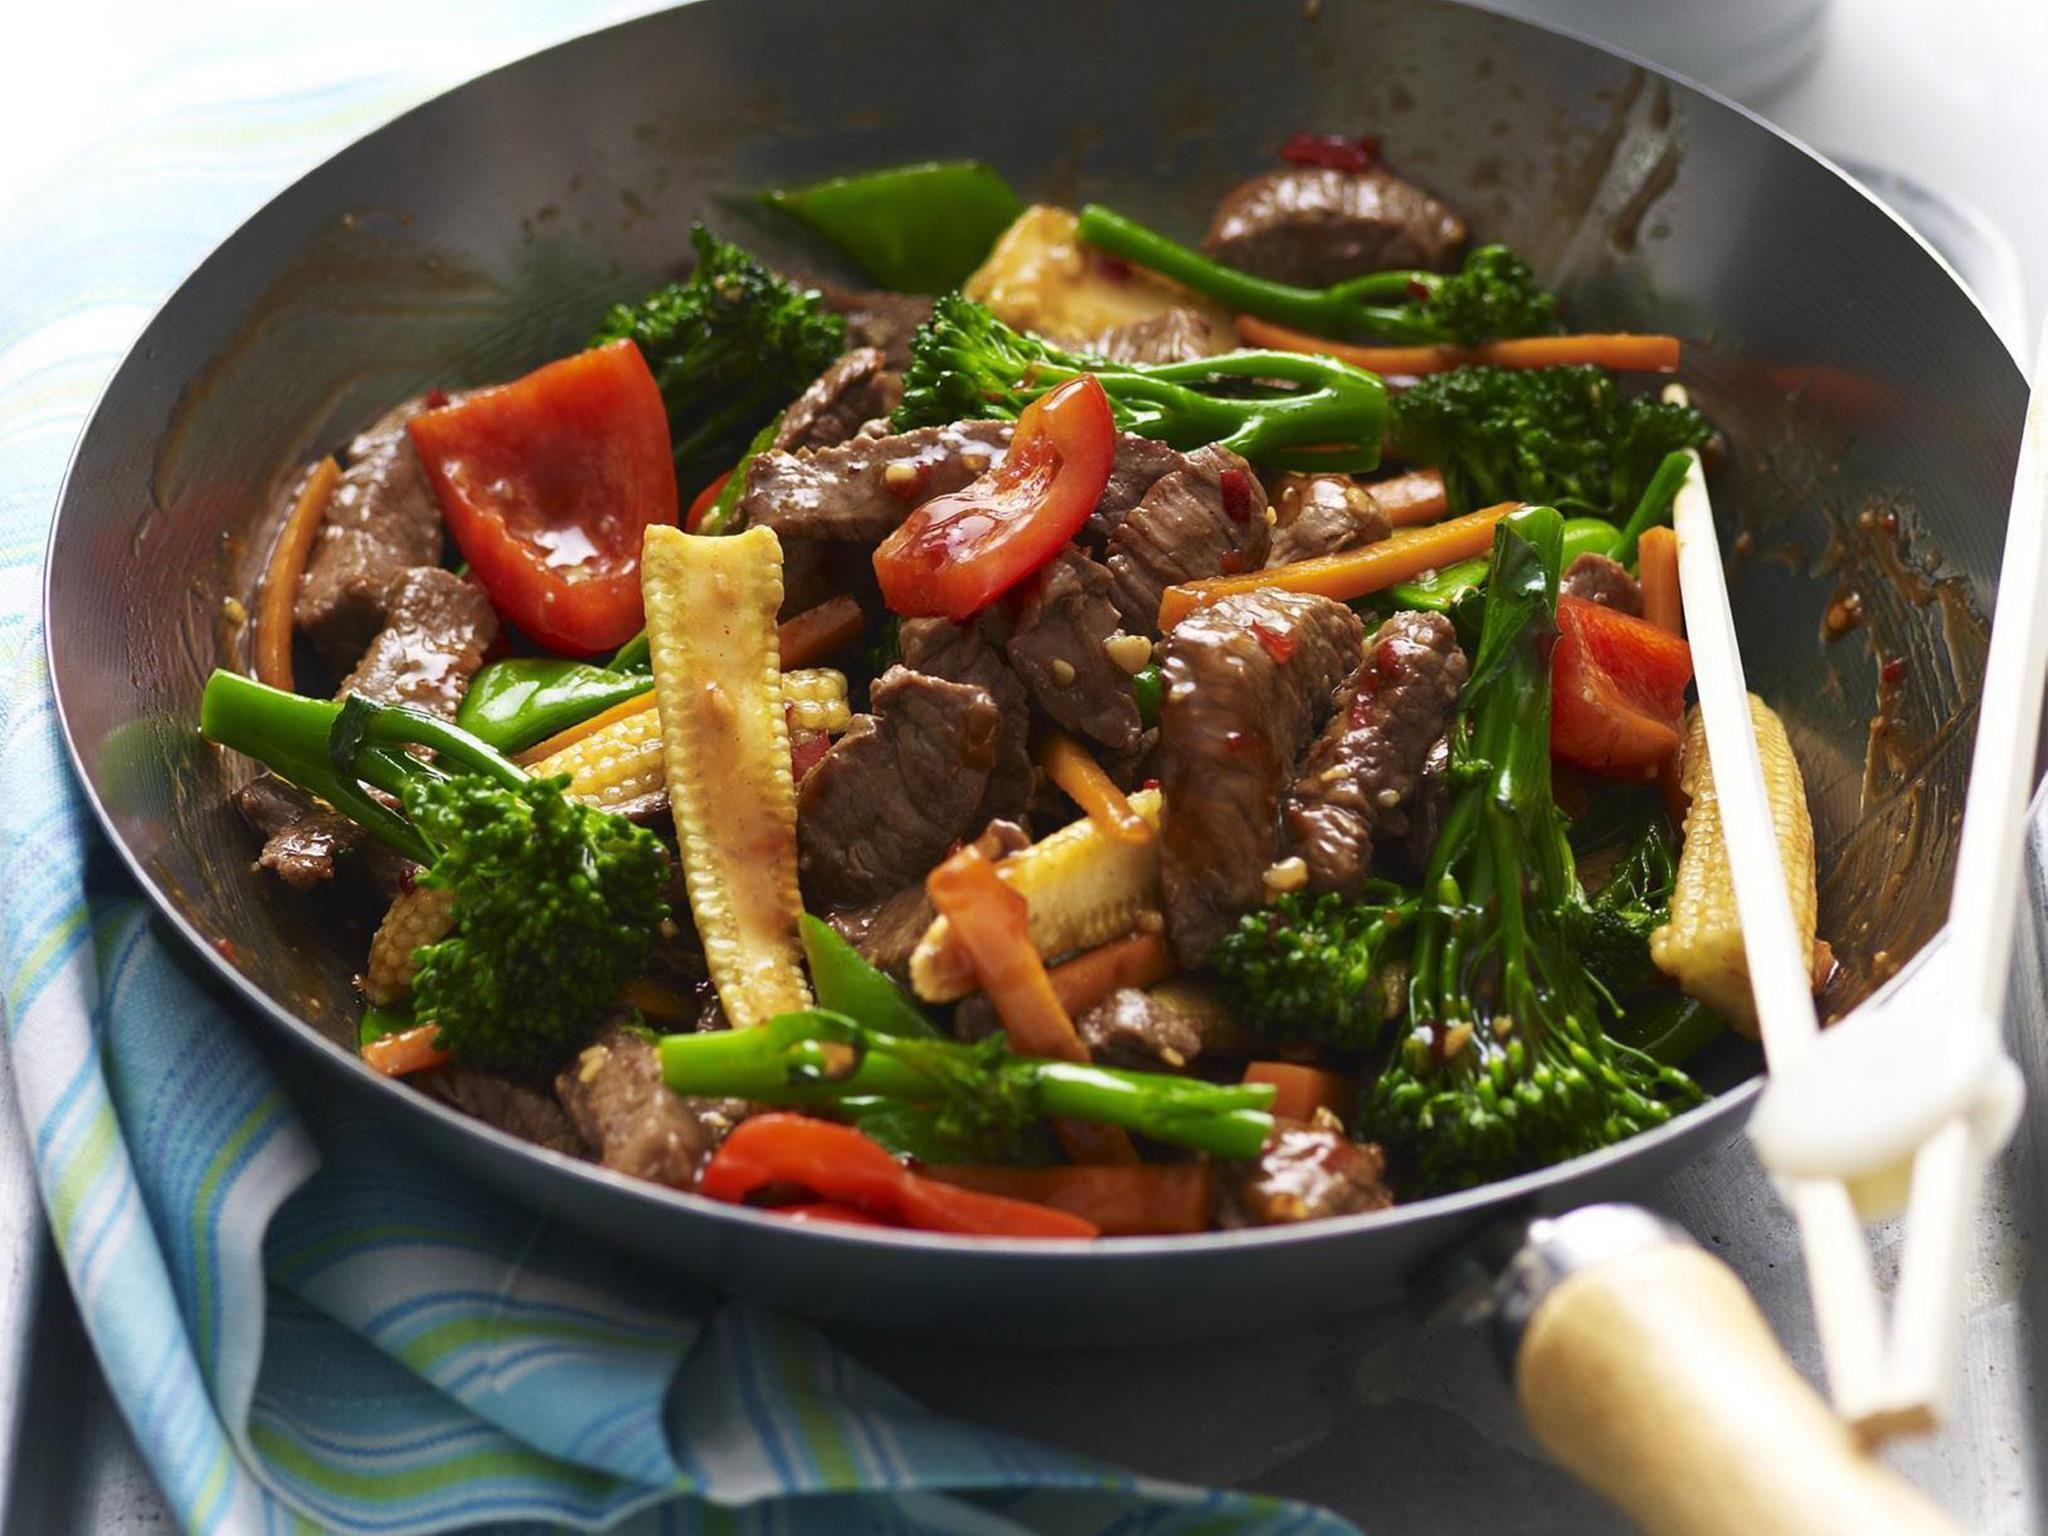 Garlic Beef Stir Fry Recipe Beef Stir Fry Recipes Beef Stir Fry Diced Beef Recipes